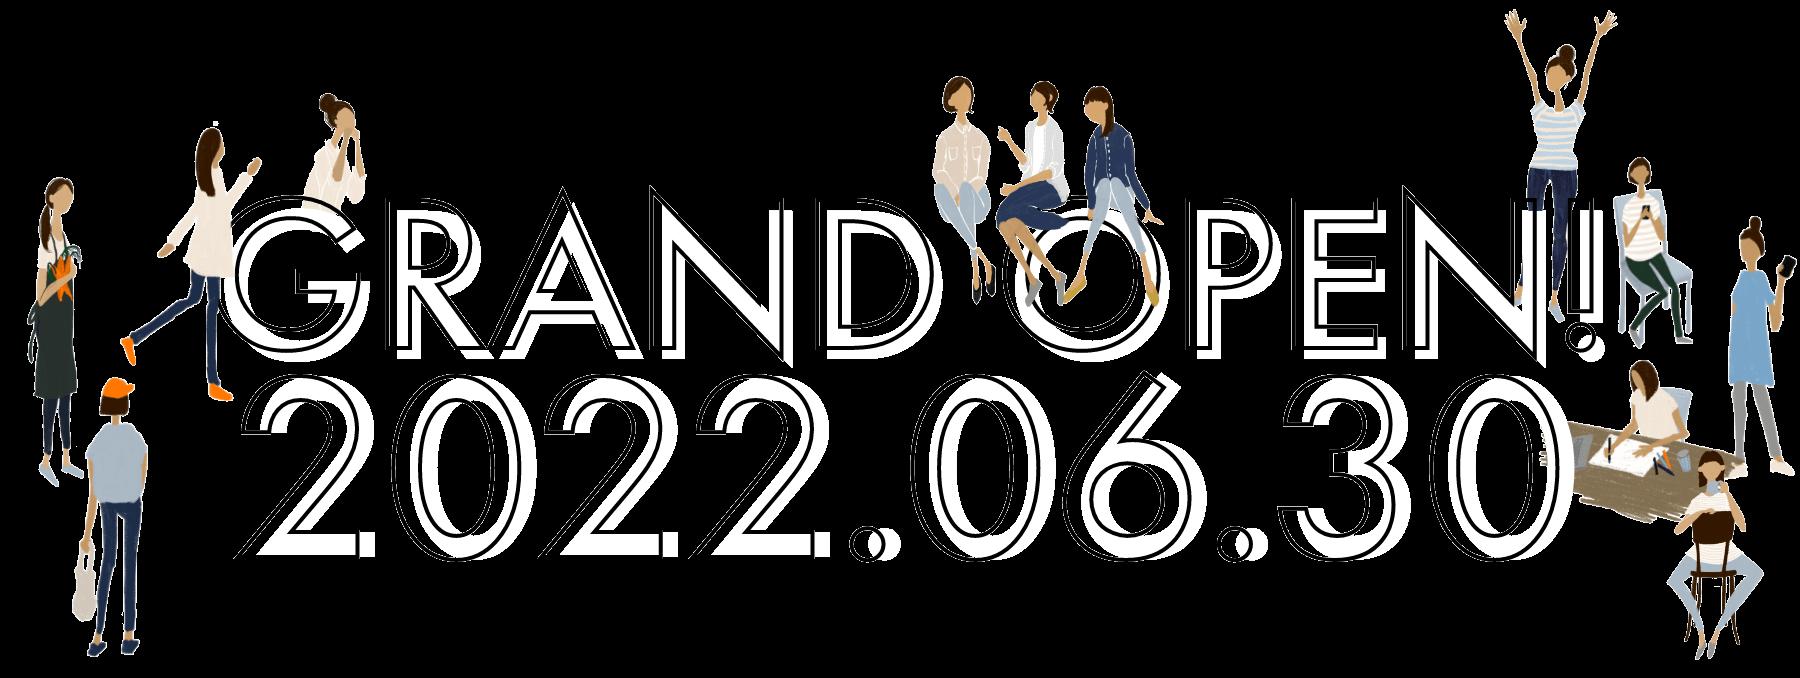 2022.6.30 GRAND OPEN!